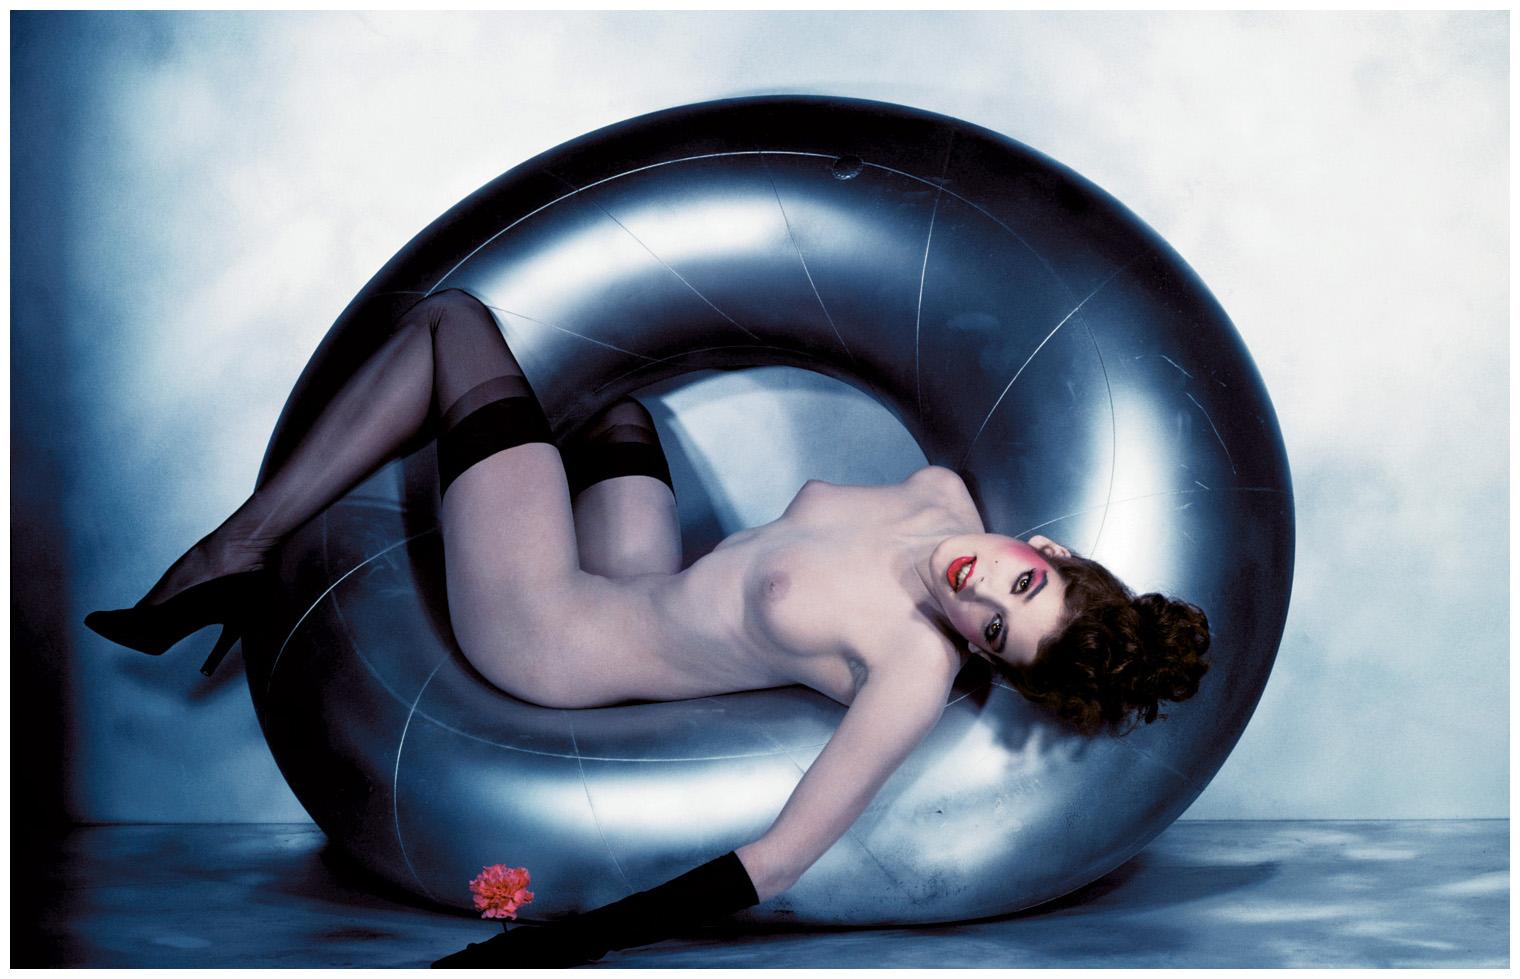 Pentax Calendar 1980 | © Pleasurephoto